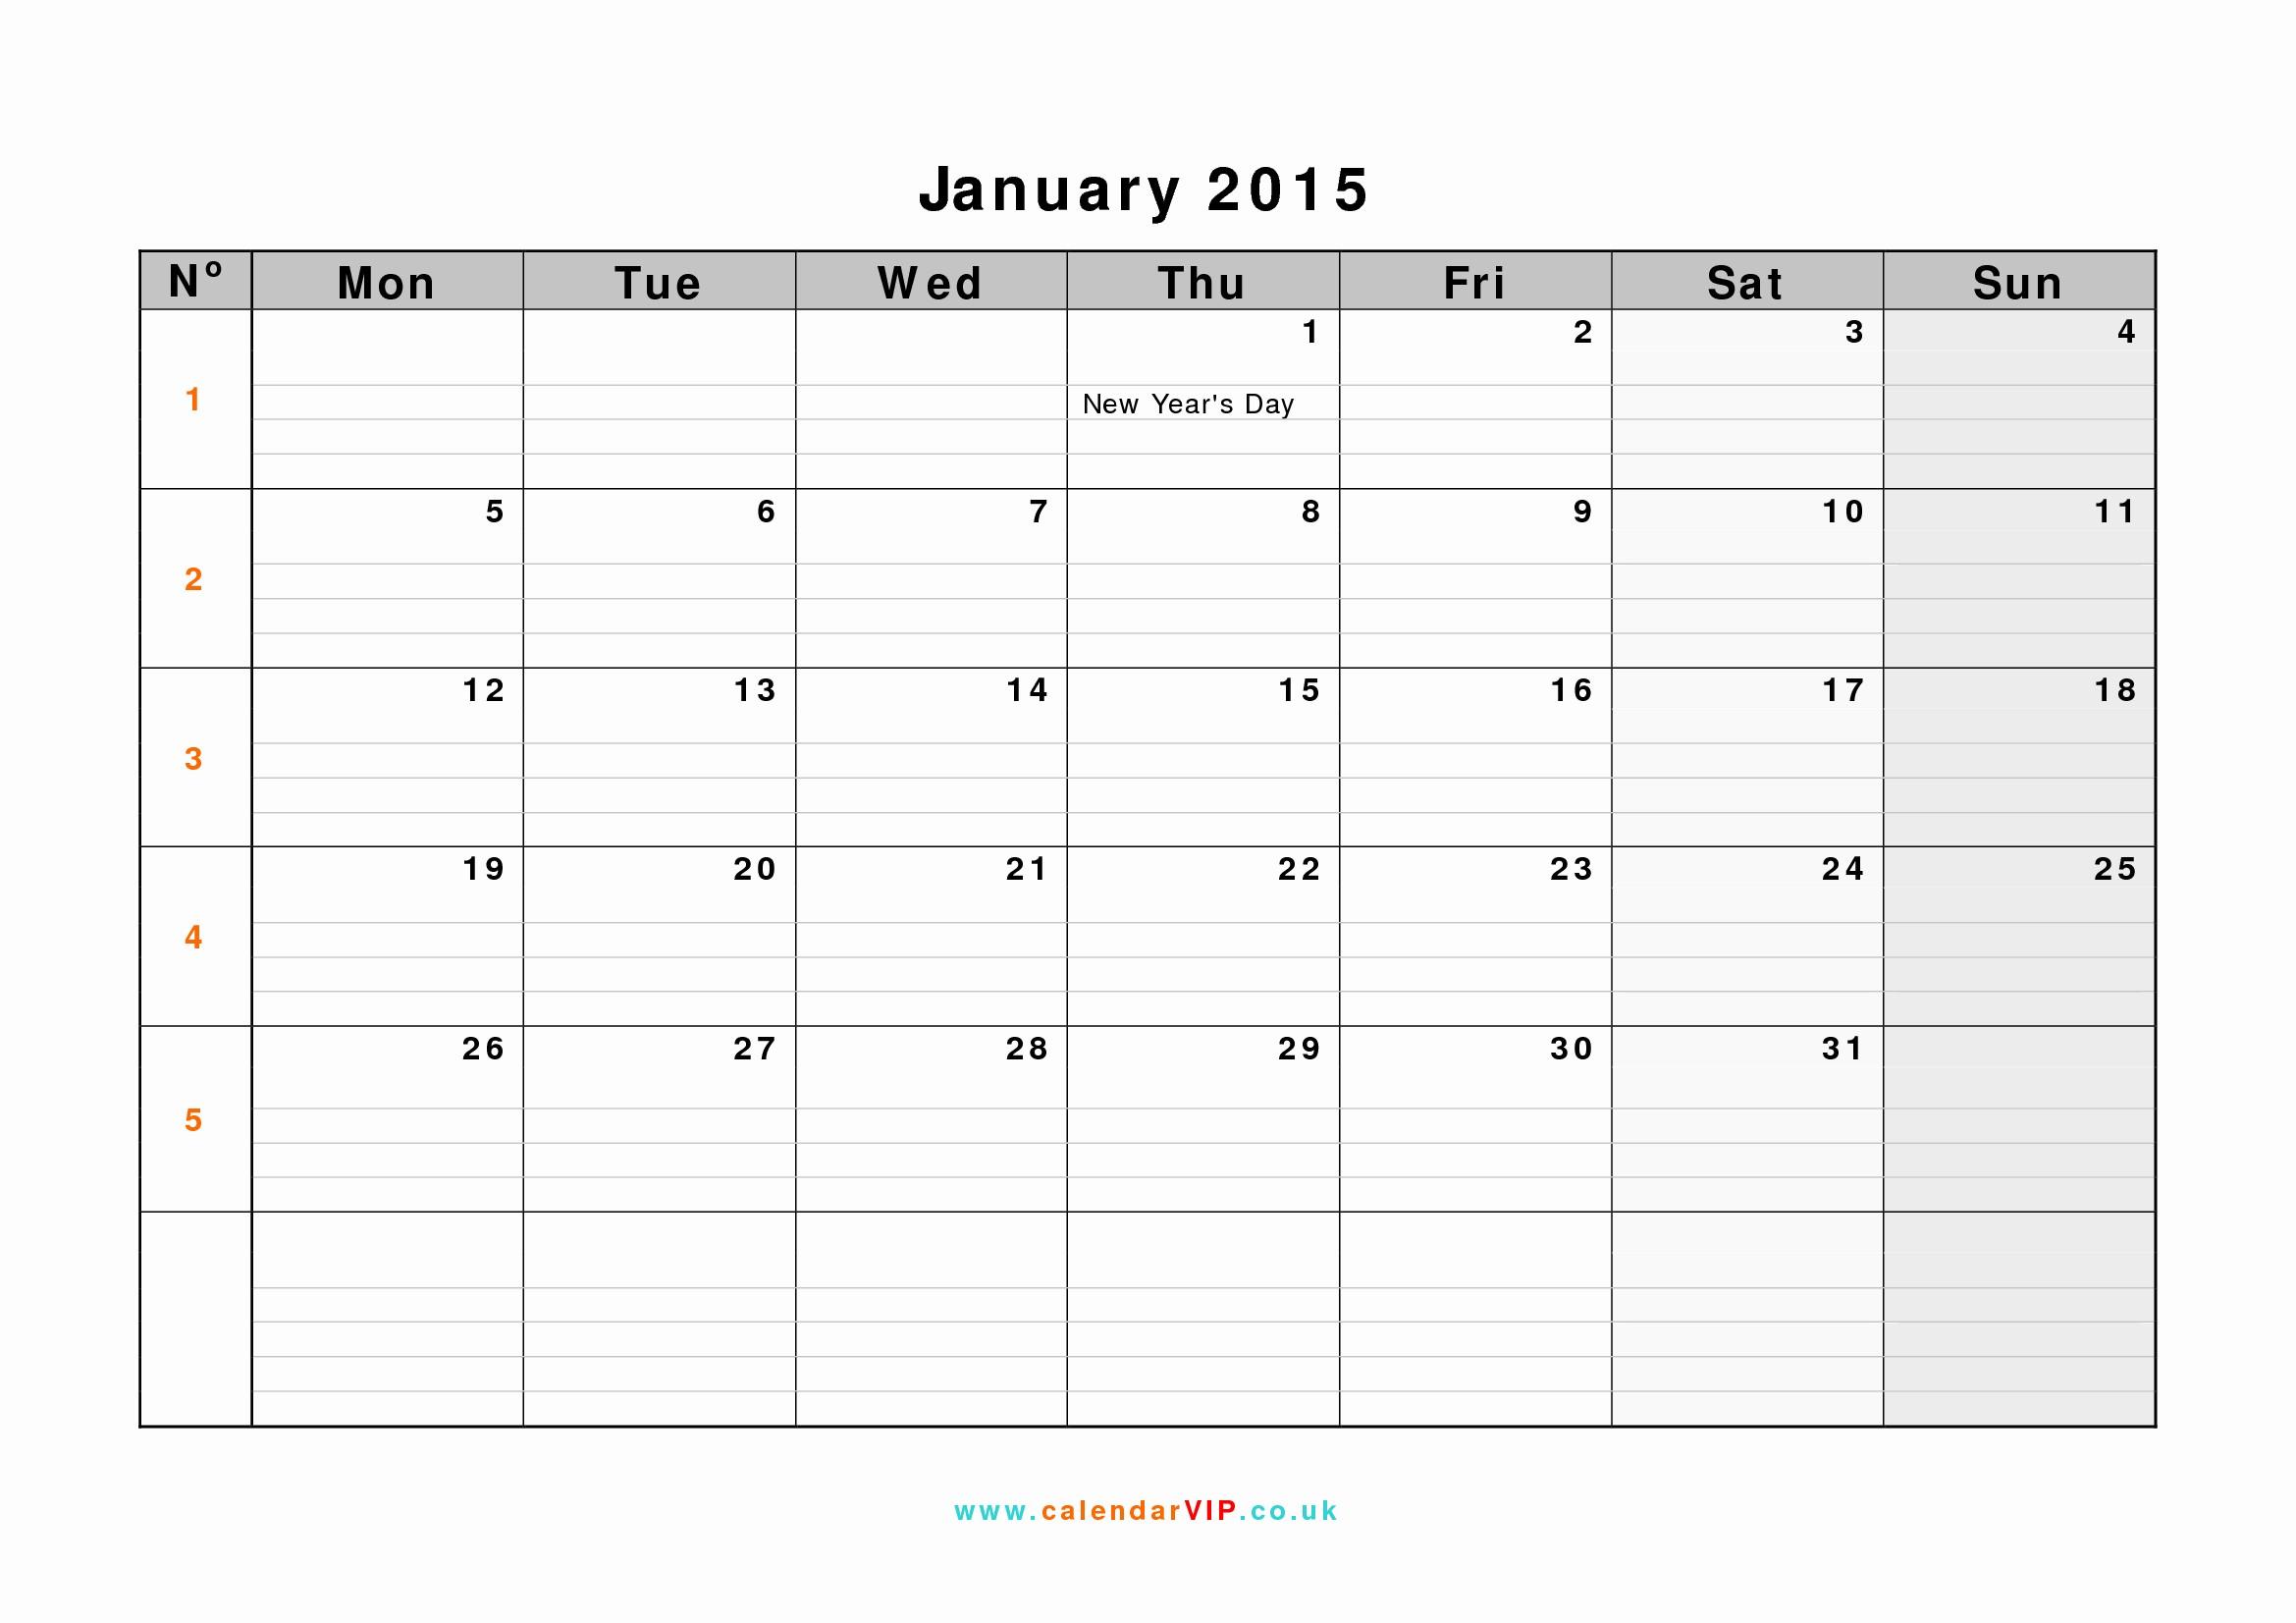 December 2015 Calendar Word Document Elegant Calendar 2015 Uk Free Yearly Calendar Templates for Uk